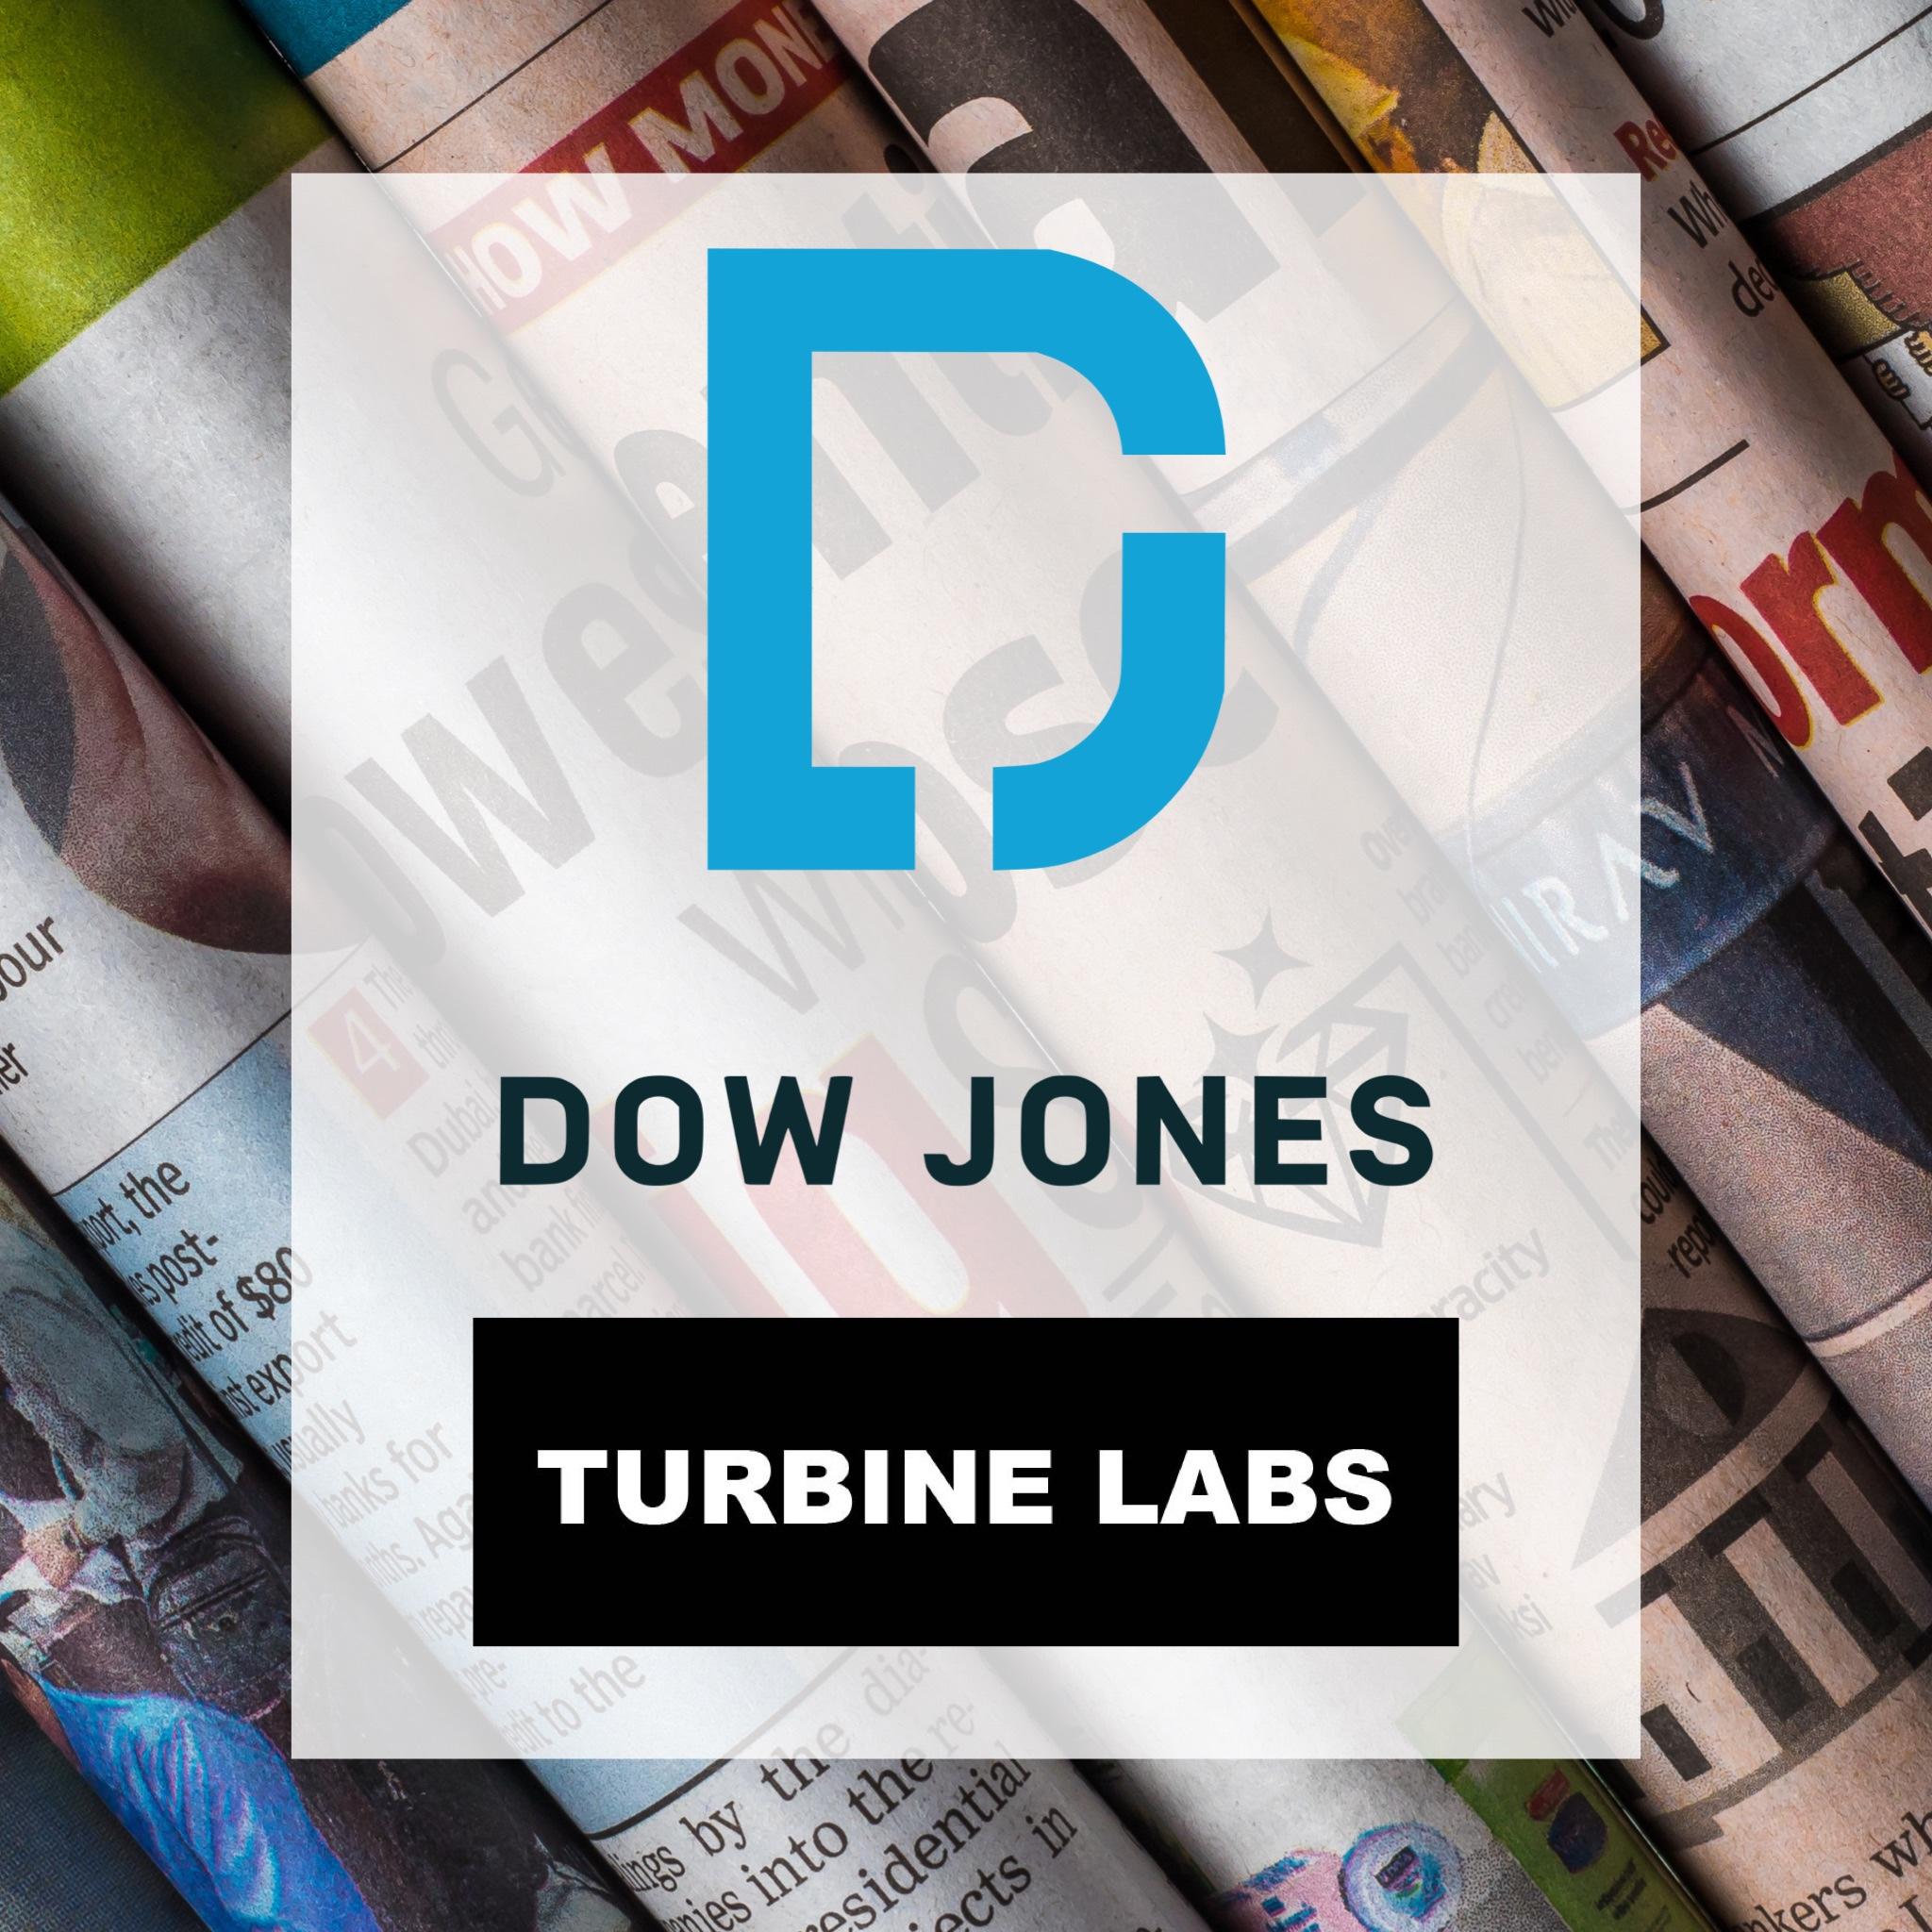 Turbine-labs-Dow-jones.jpeg